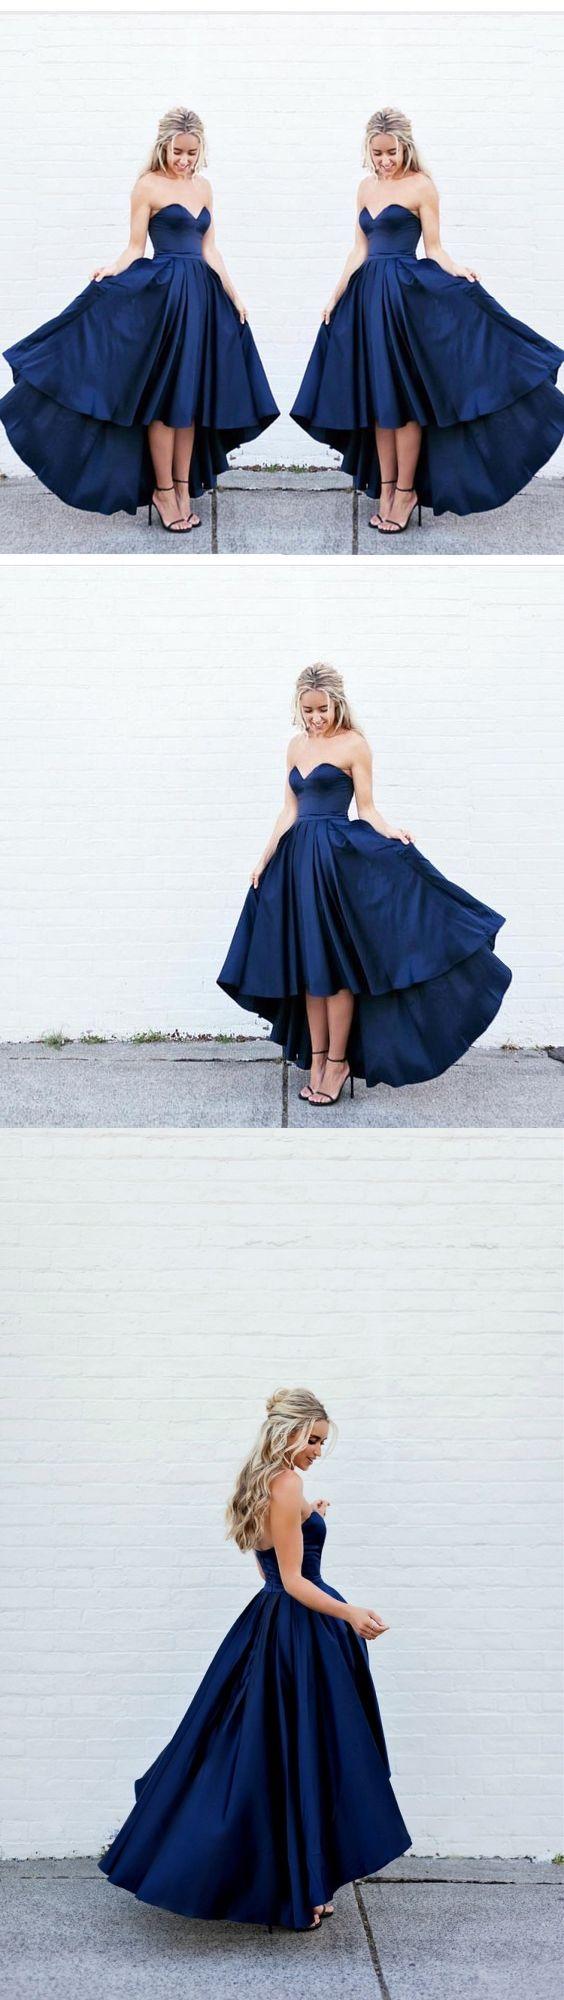 homecoming dress asymmetrical sleeveless short prom dress party